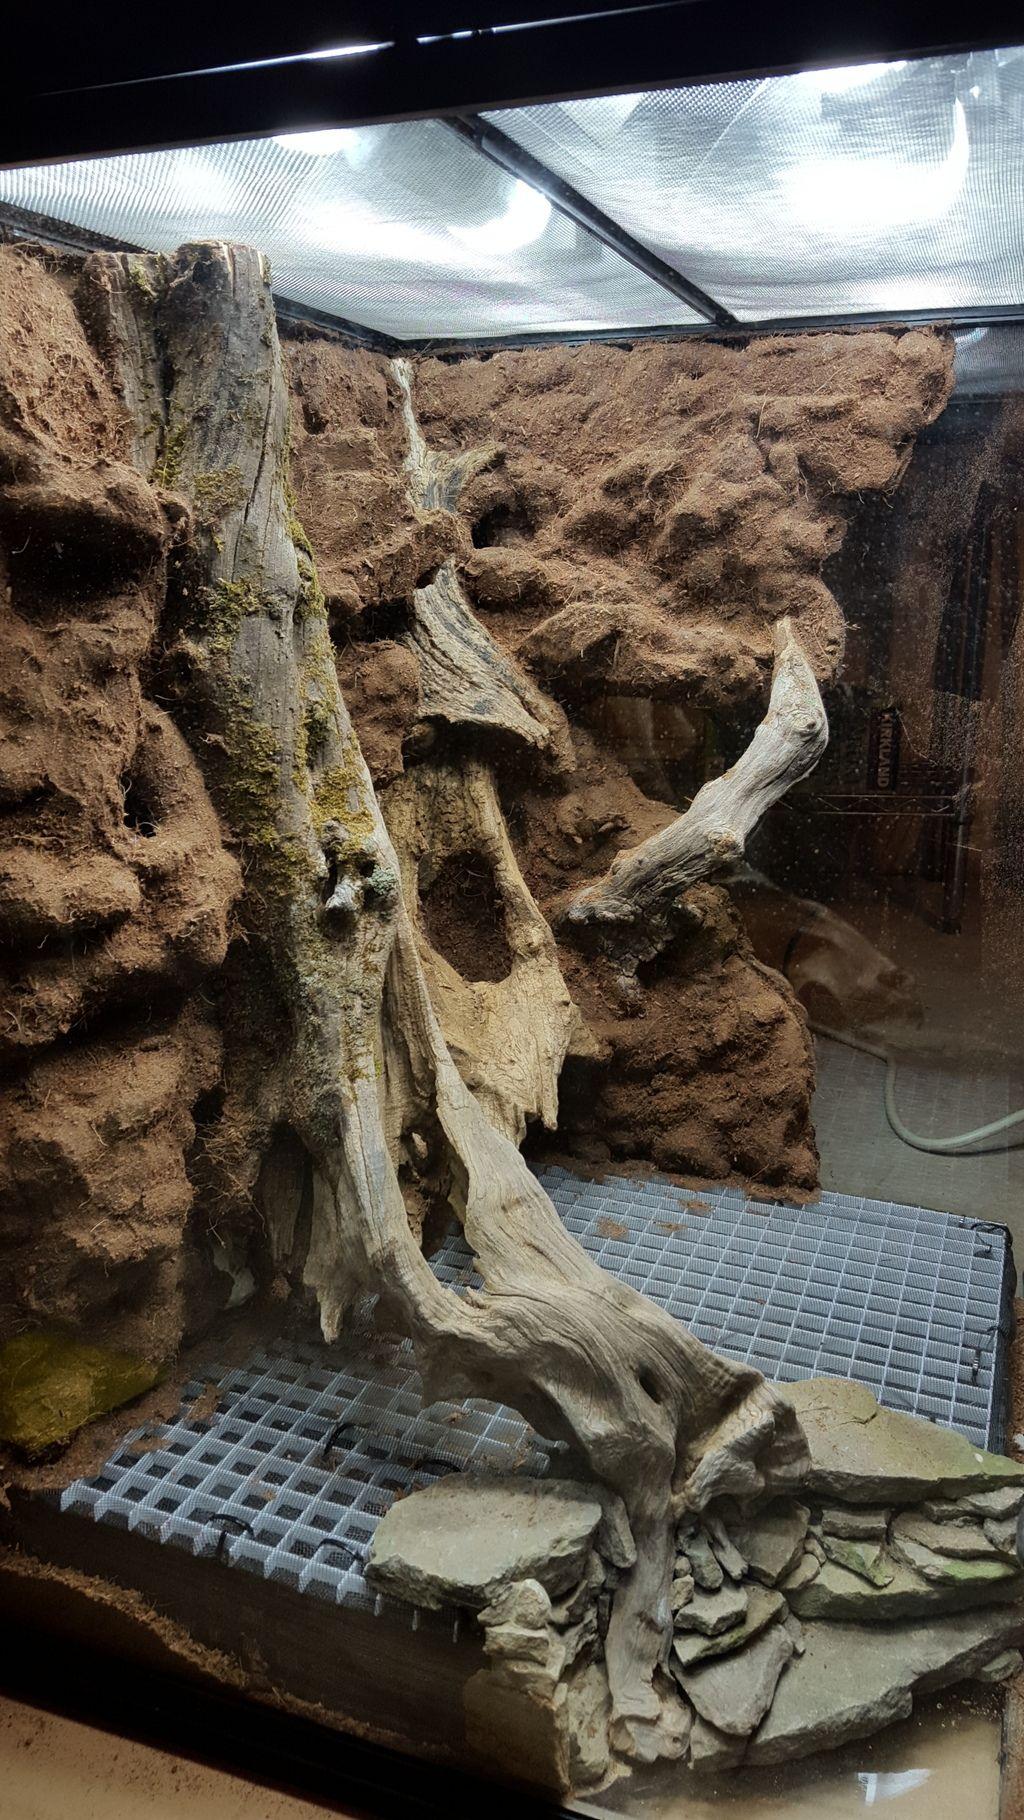 18x18x24 Twisted Root Build Dendroboard Reptilienhaltung Terrarien Reptilien